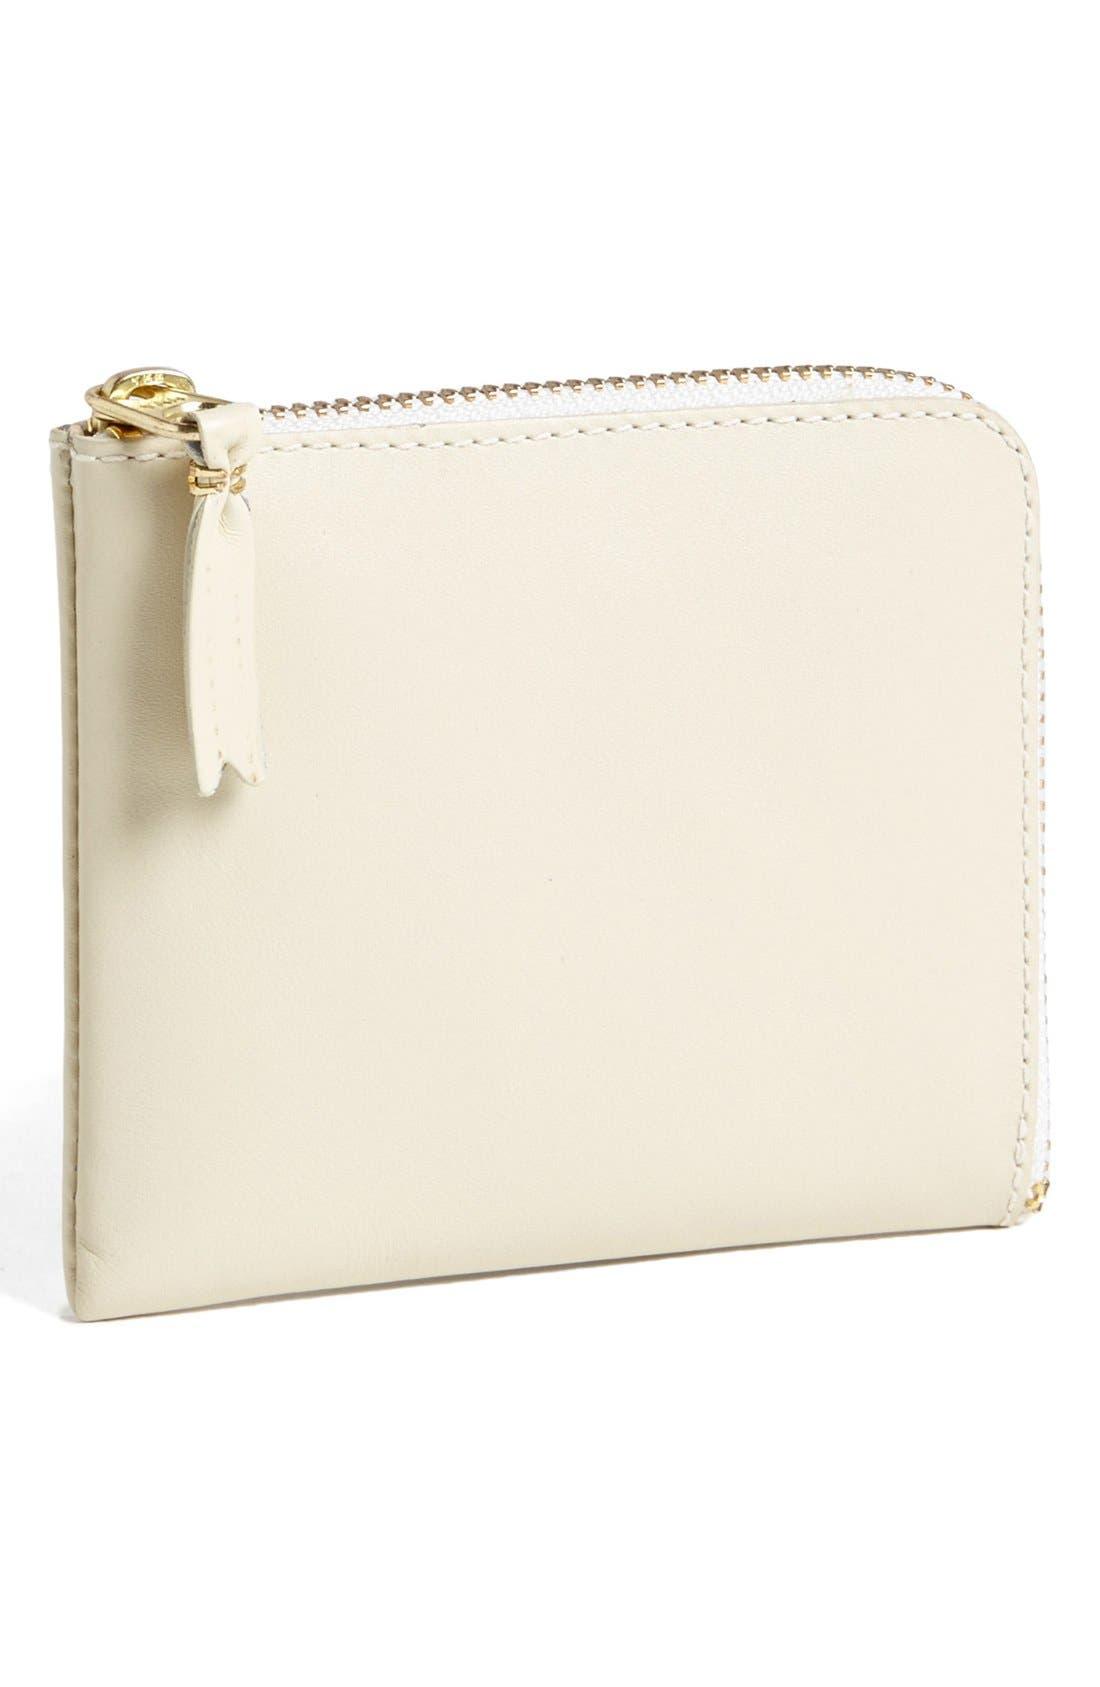 Half-Zip Leather Wallet, Main, color, 110